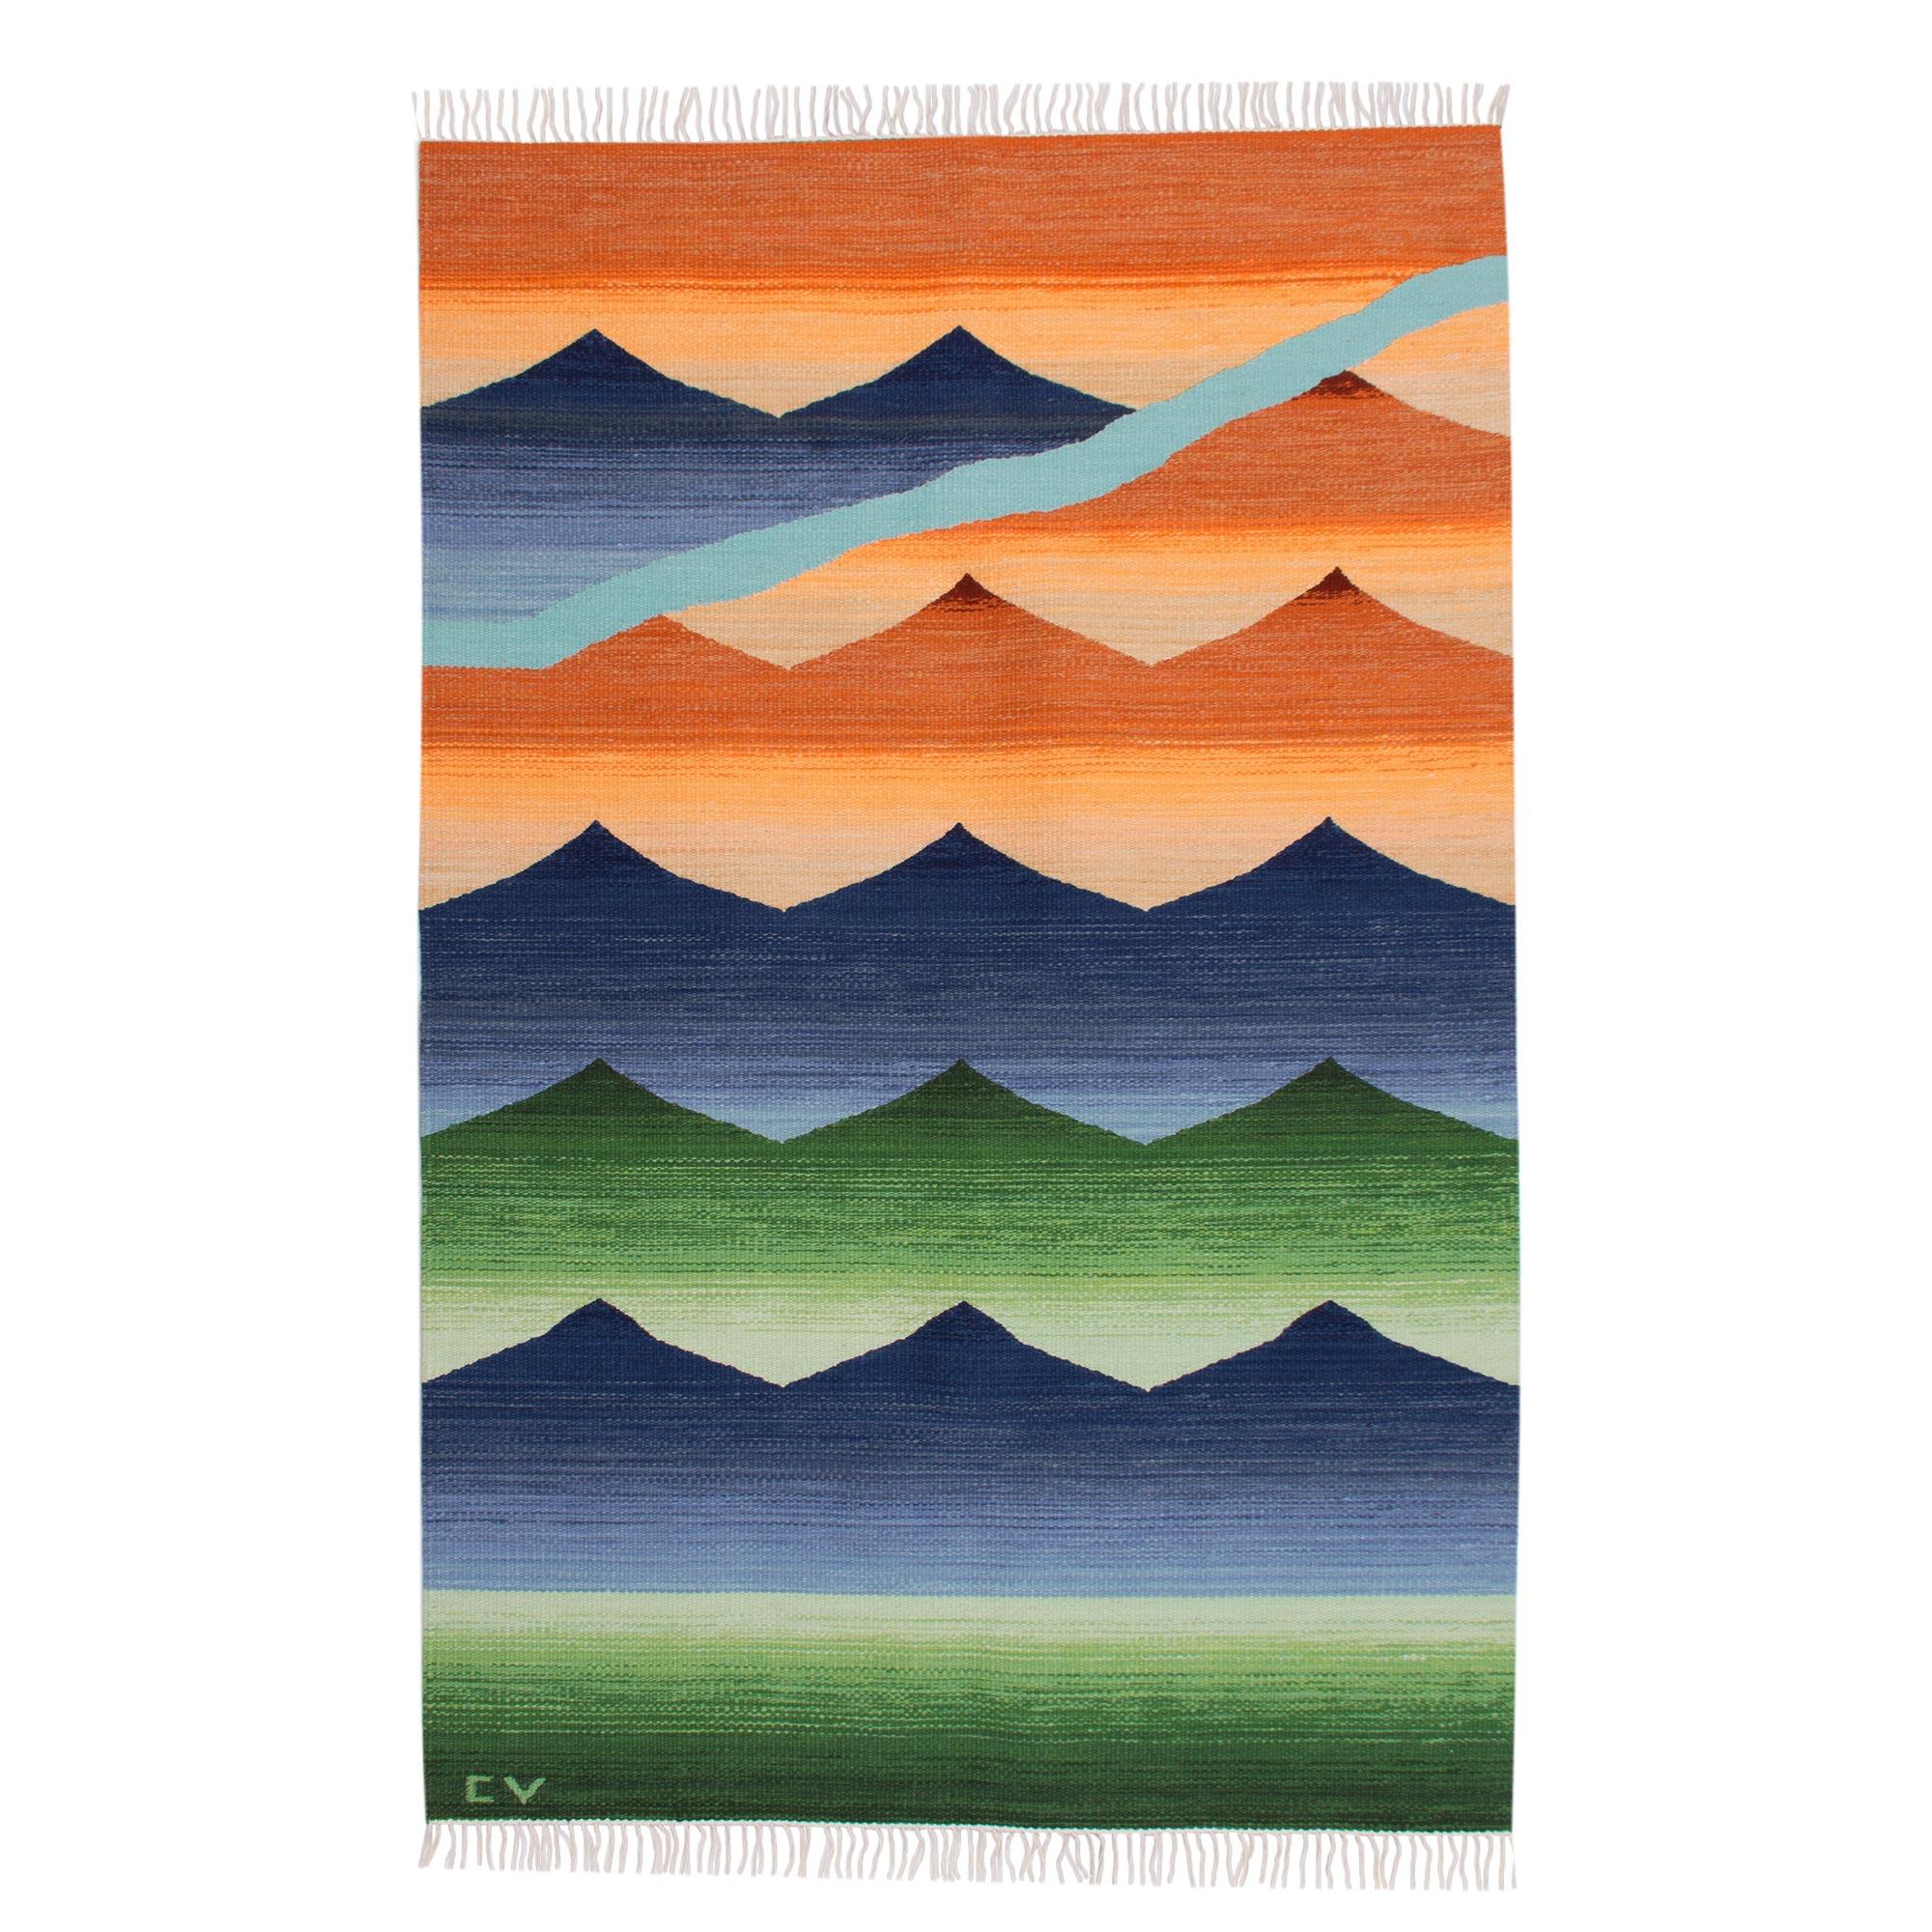 Kiva Store Peruvian Hand Loomed Wool Area Rug 4x6 Sunset